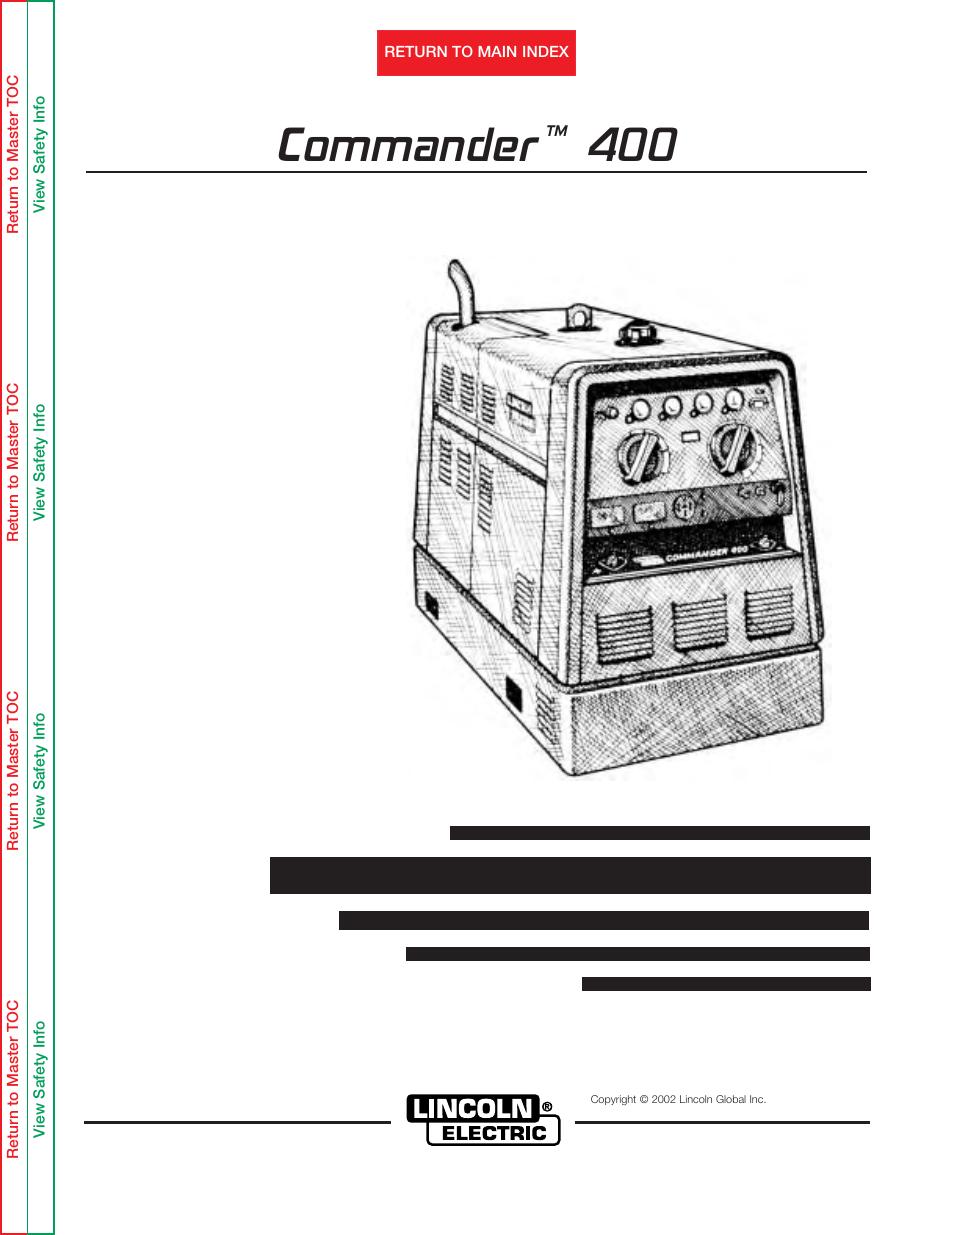 lincoln electric commander 400 svm133 b manuel d utilisation pages rh modes d emploi com invensys ech 400 manual ech 400 manual